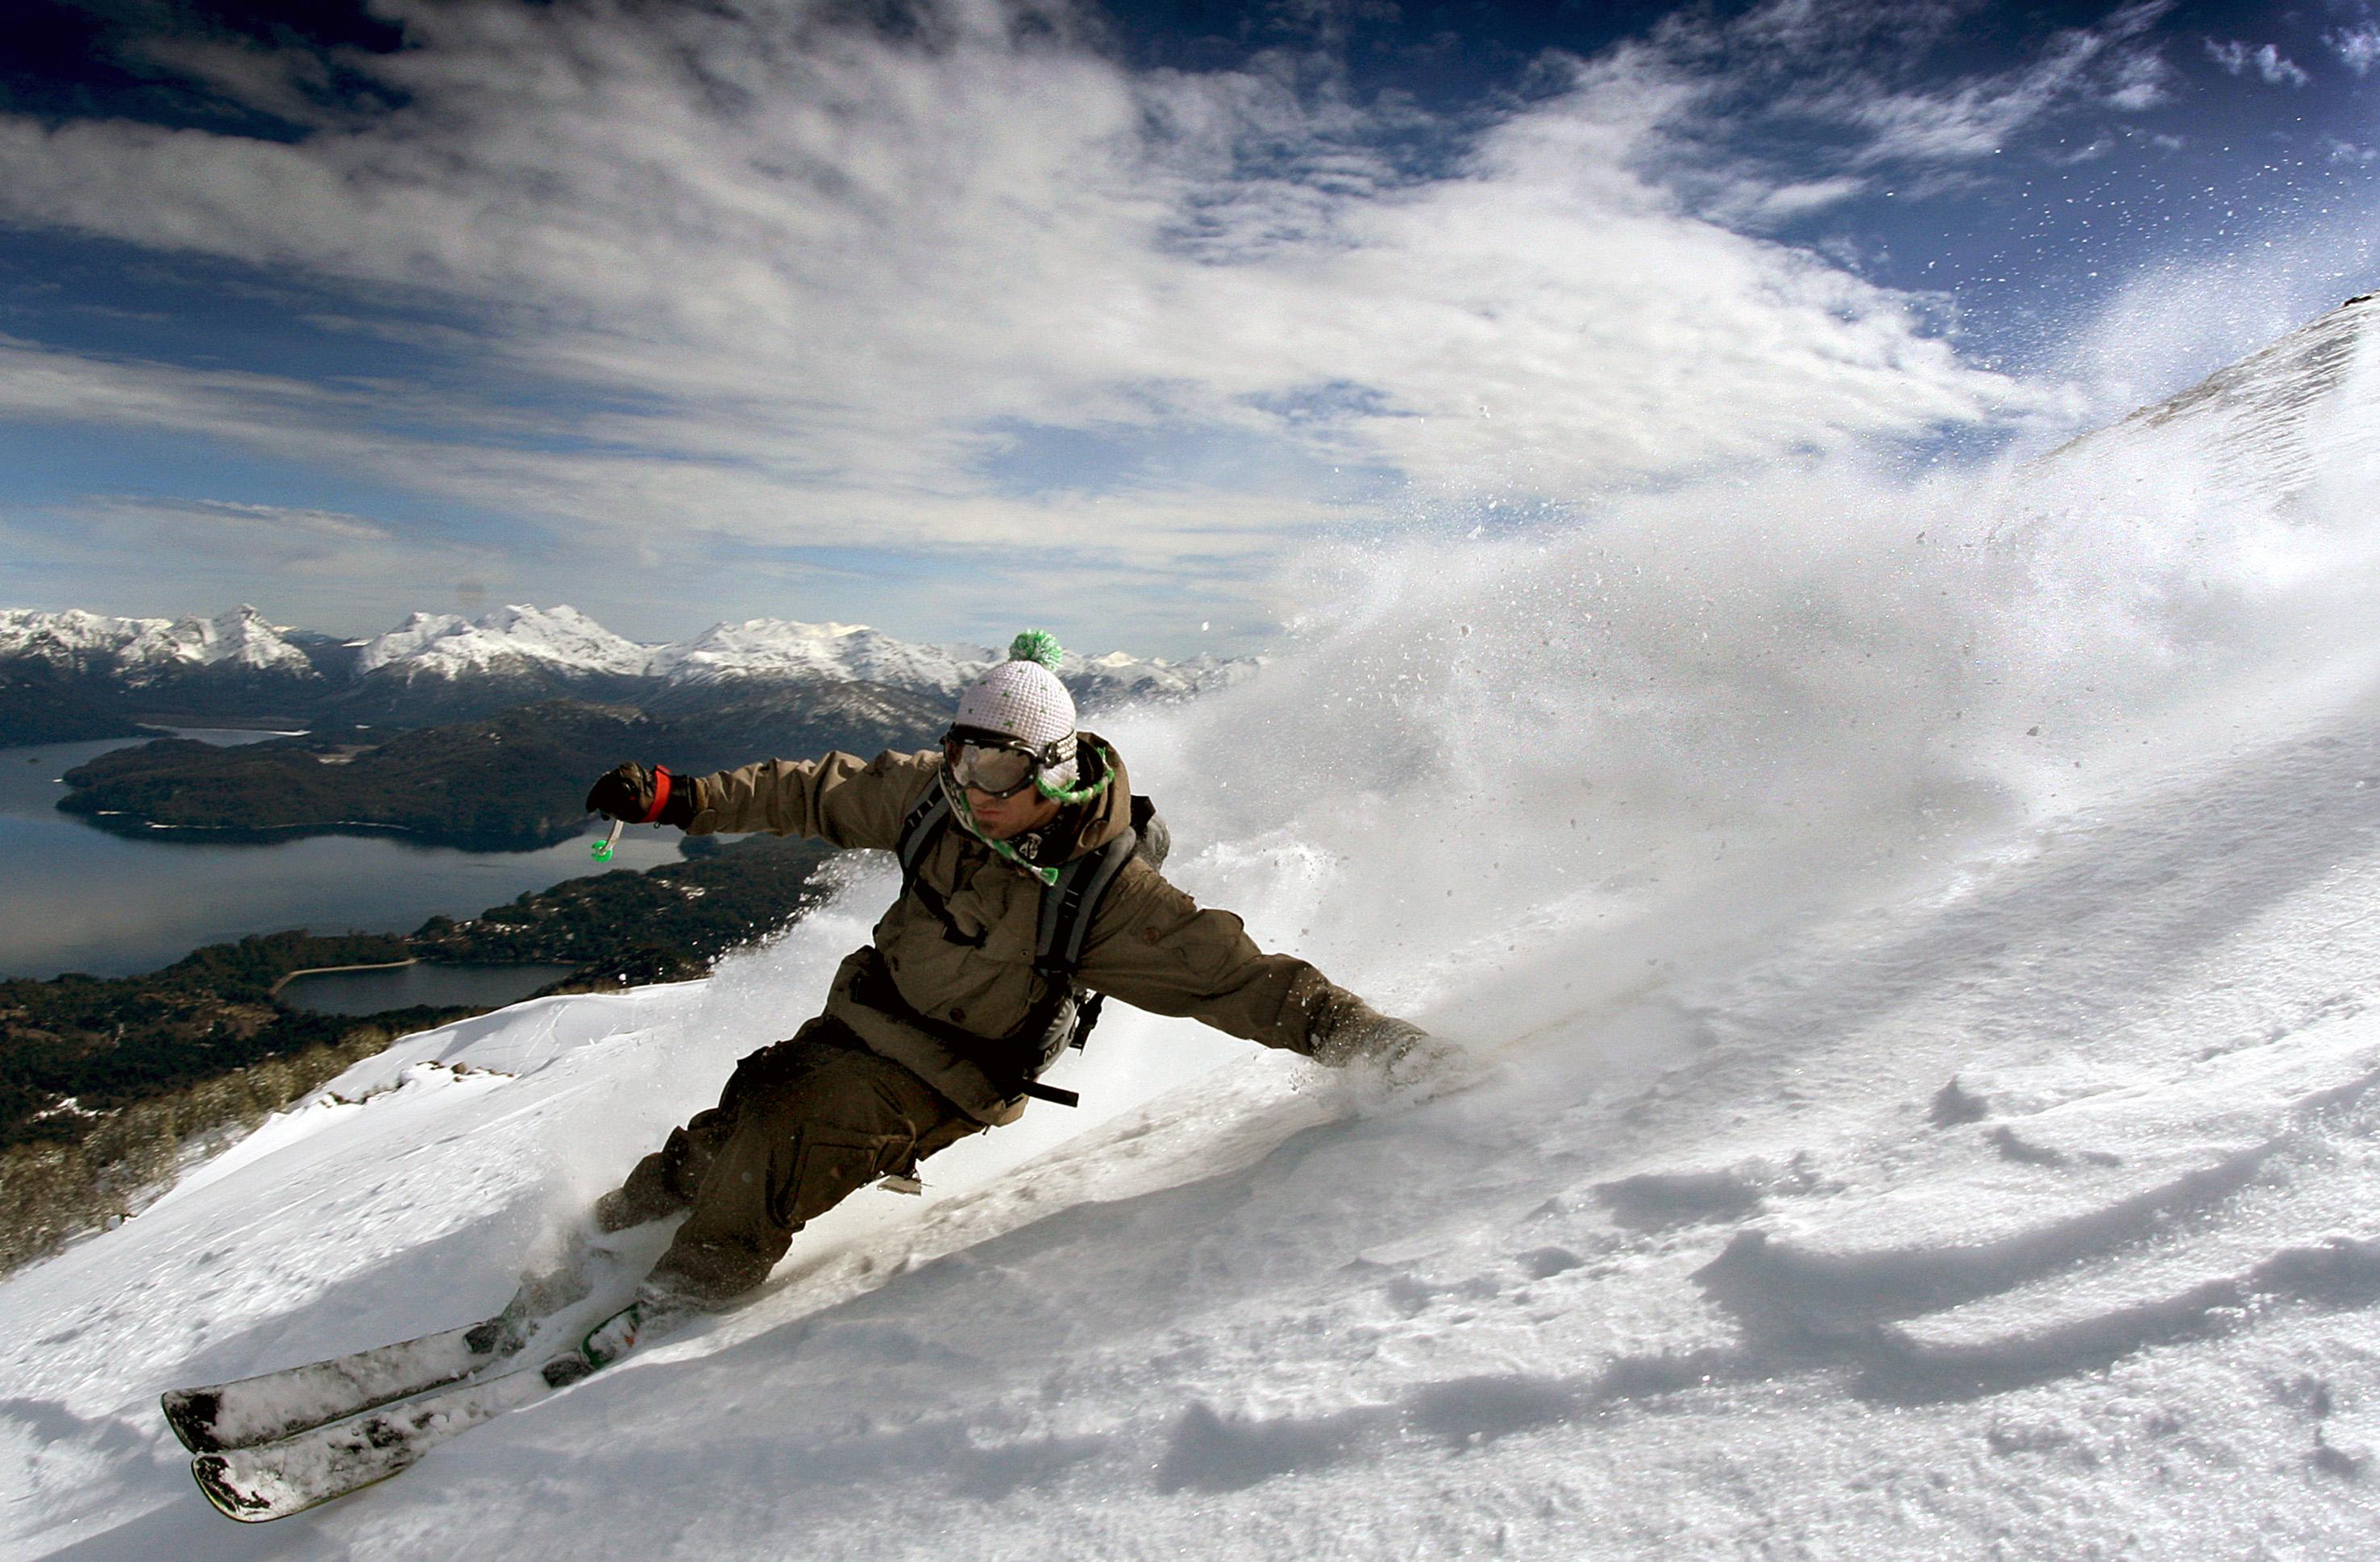 SnowTrip:: Balada e muita neve na Argentina